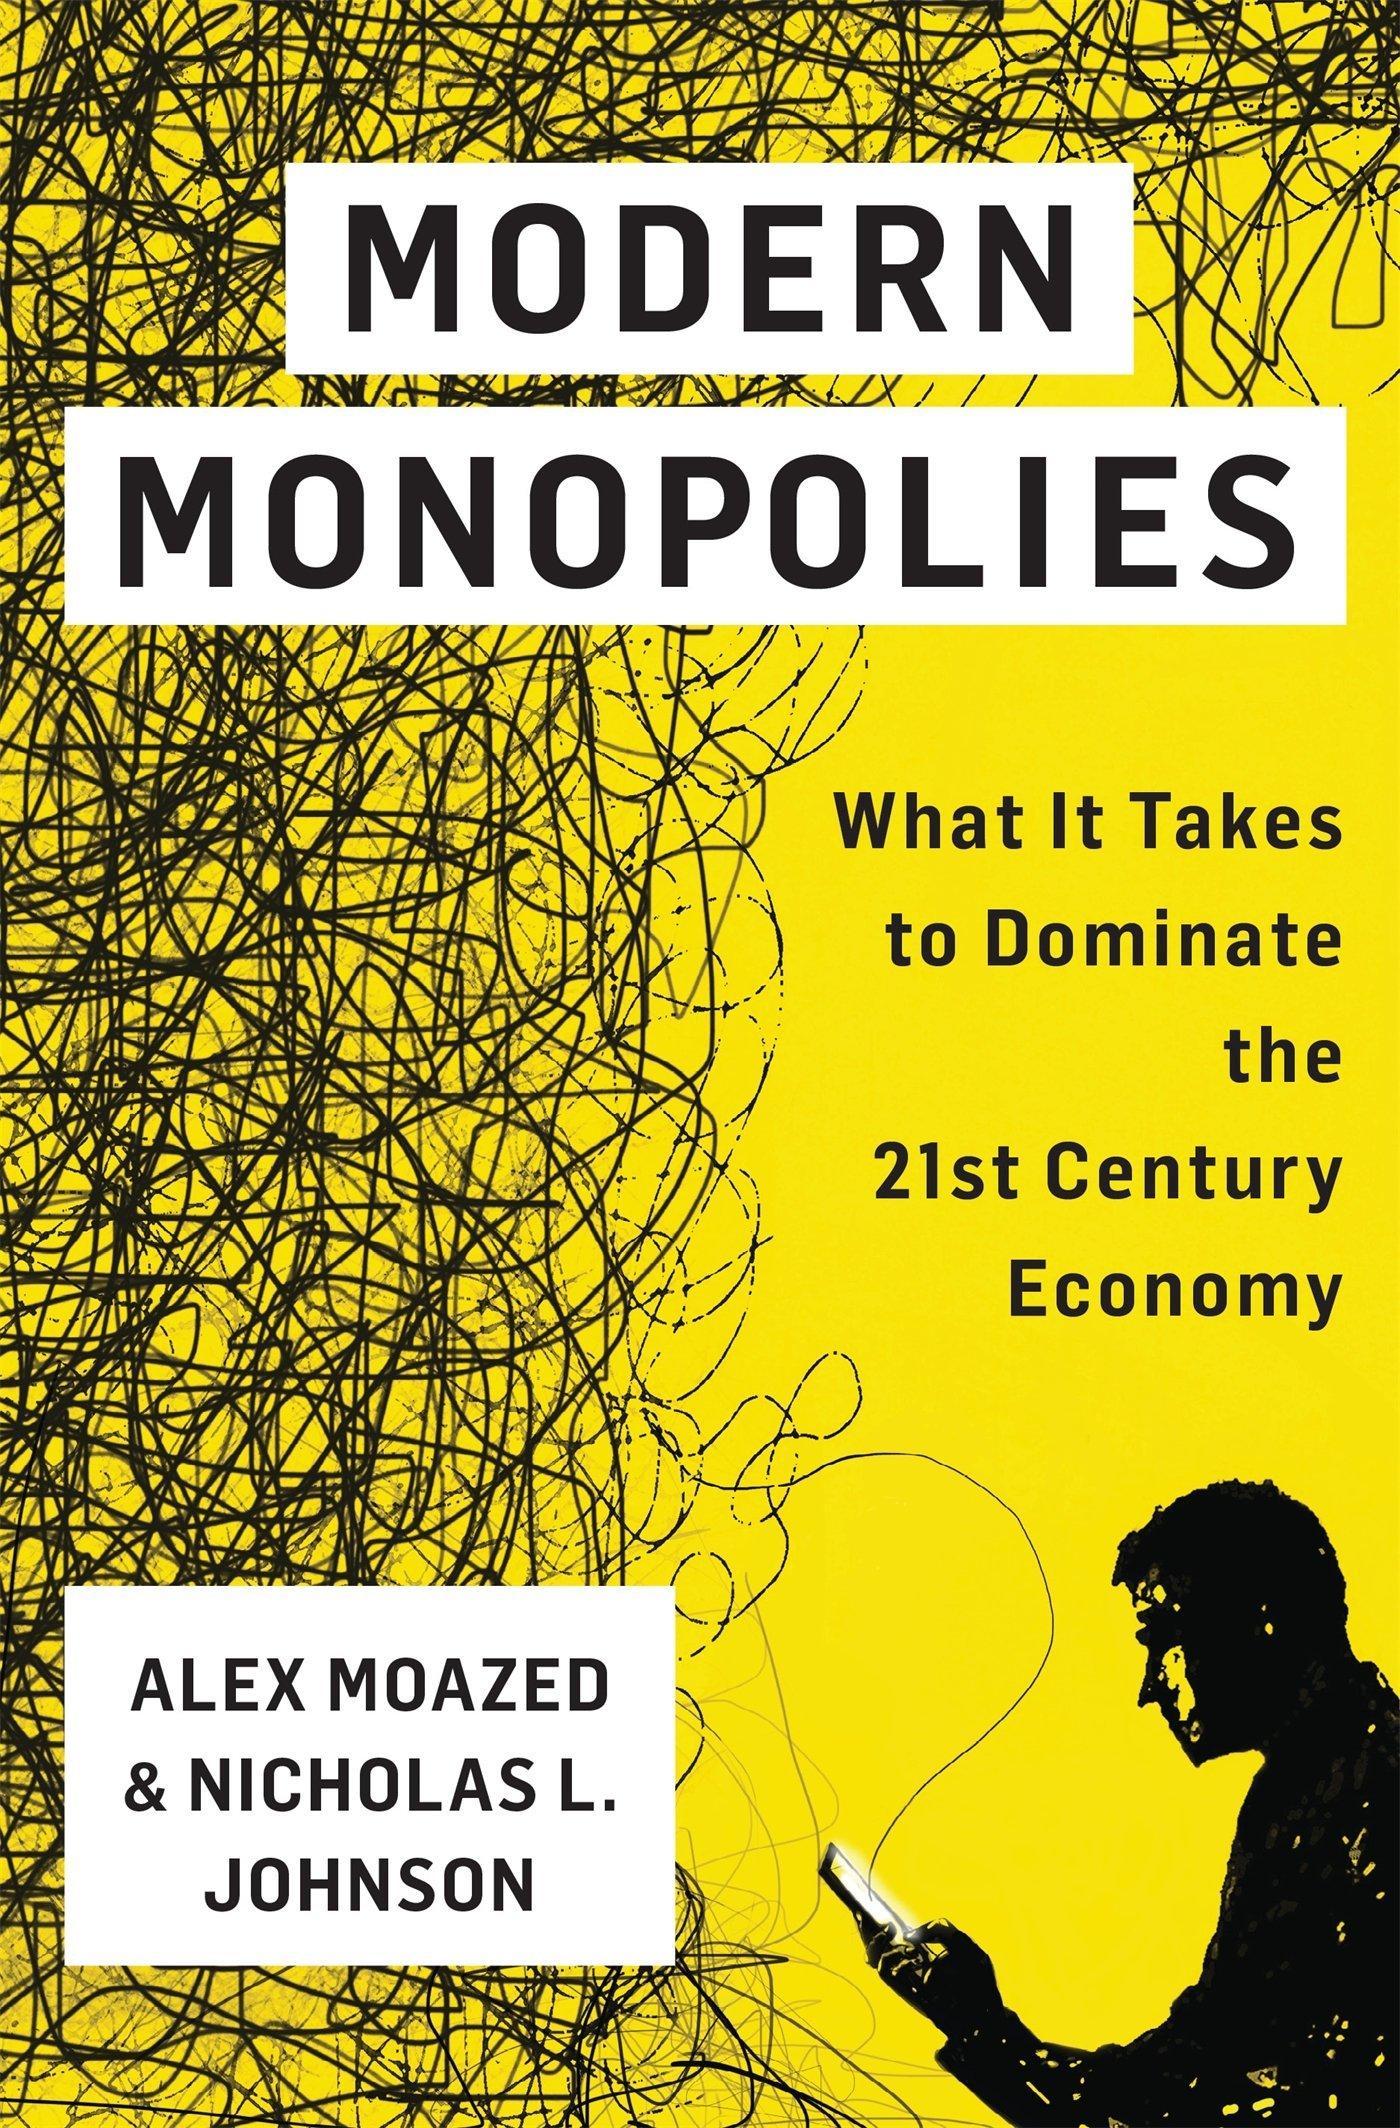 Modern Monopolies.jpg